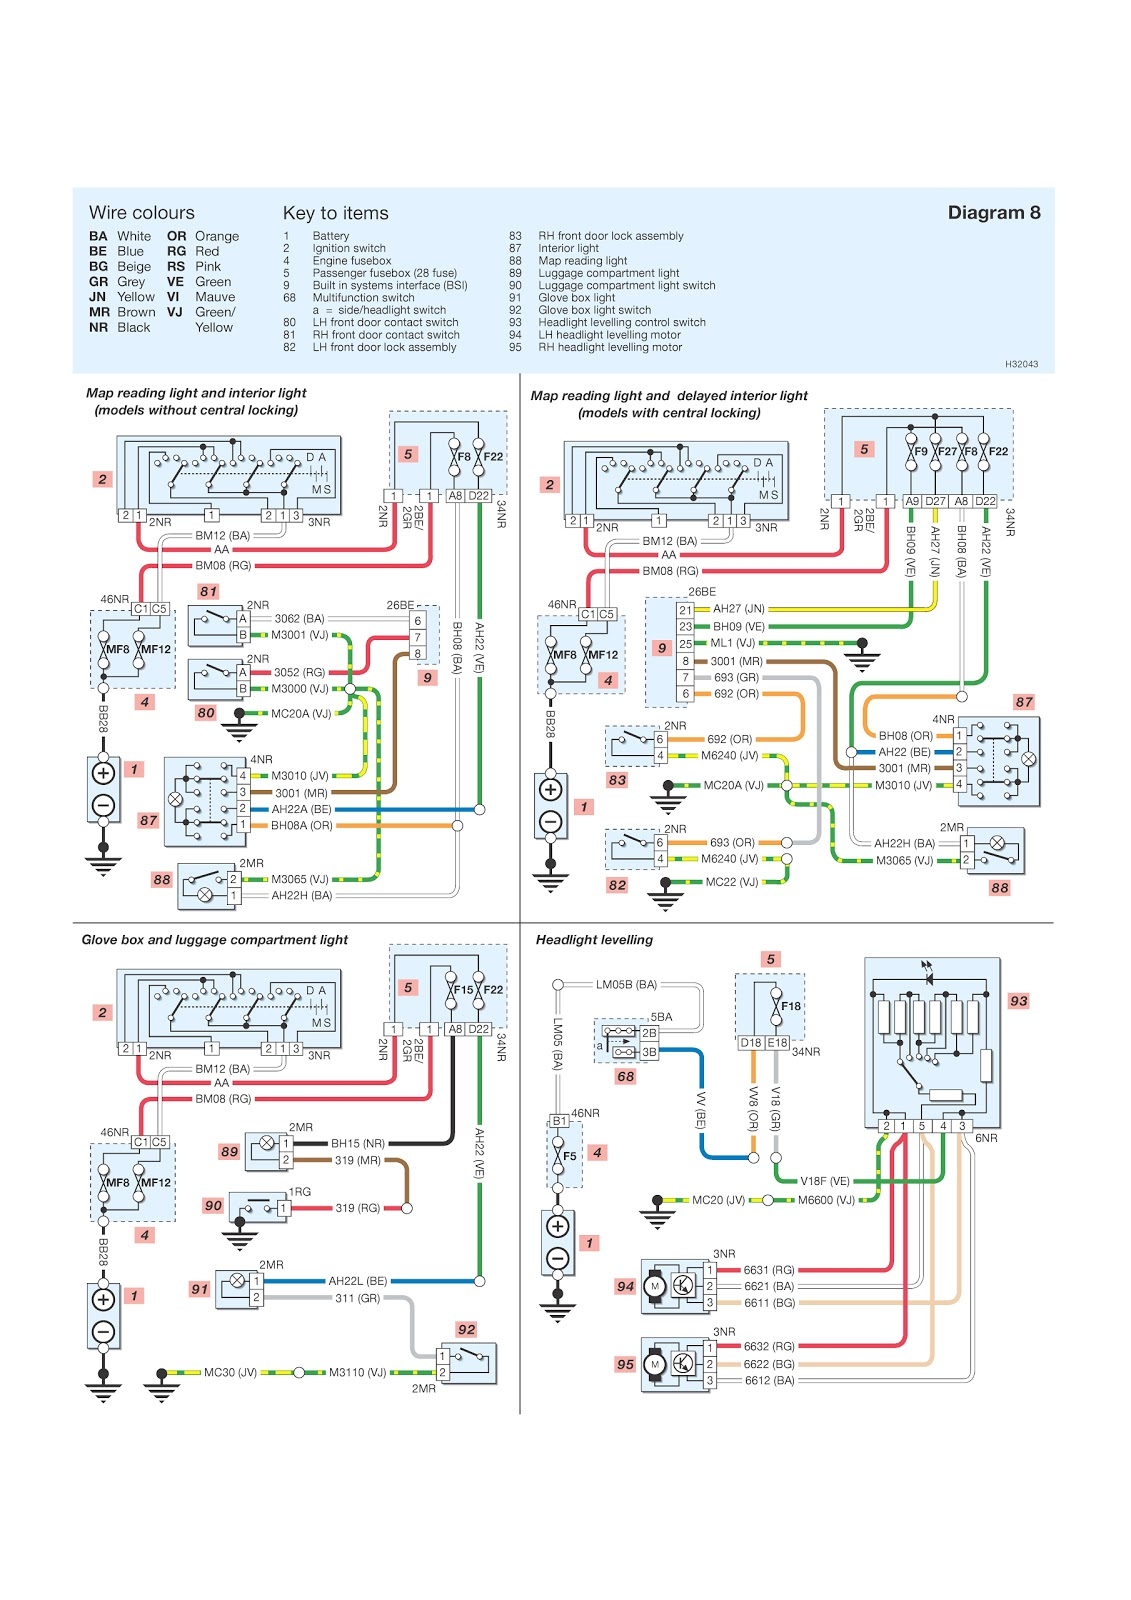 peugeot 307 light wiring diagram wiring diagram Bmw X3 Wiring Diagram peugeot 307 hdi wiring diagram wiring library